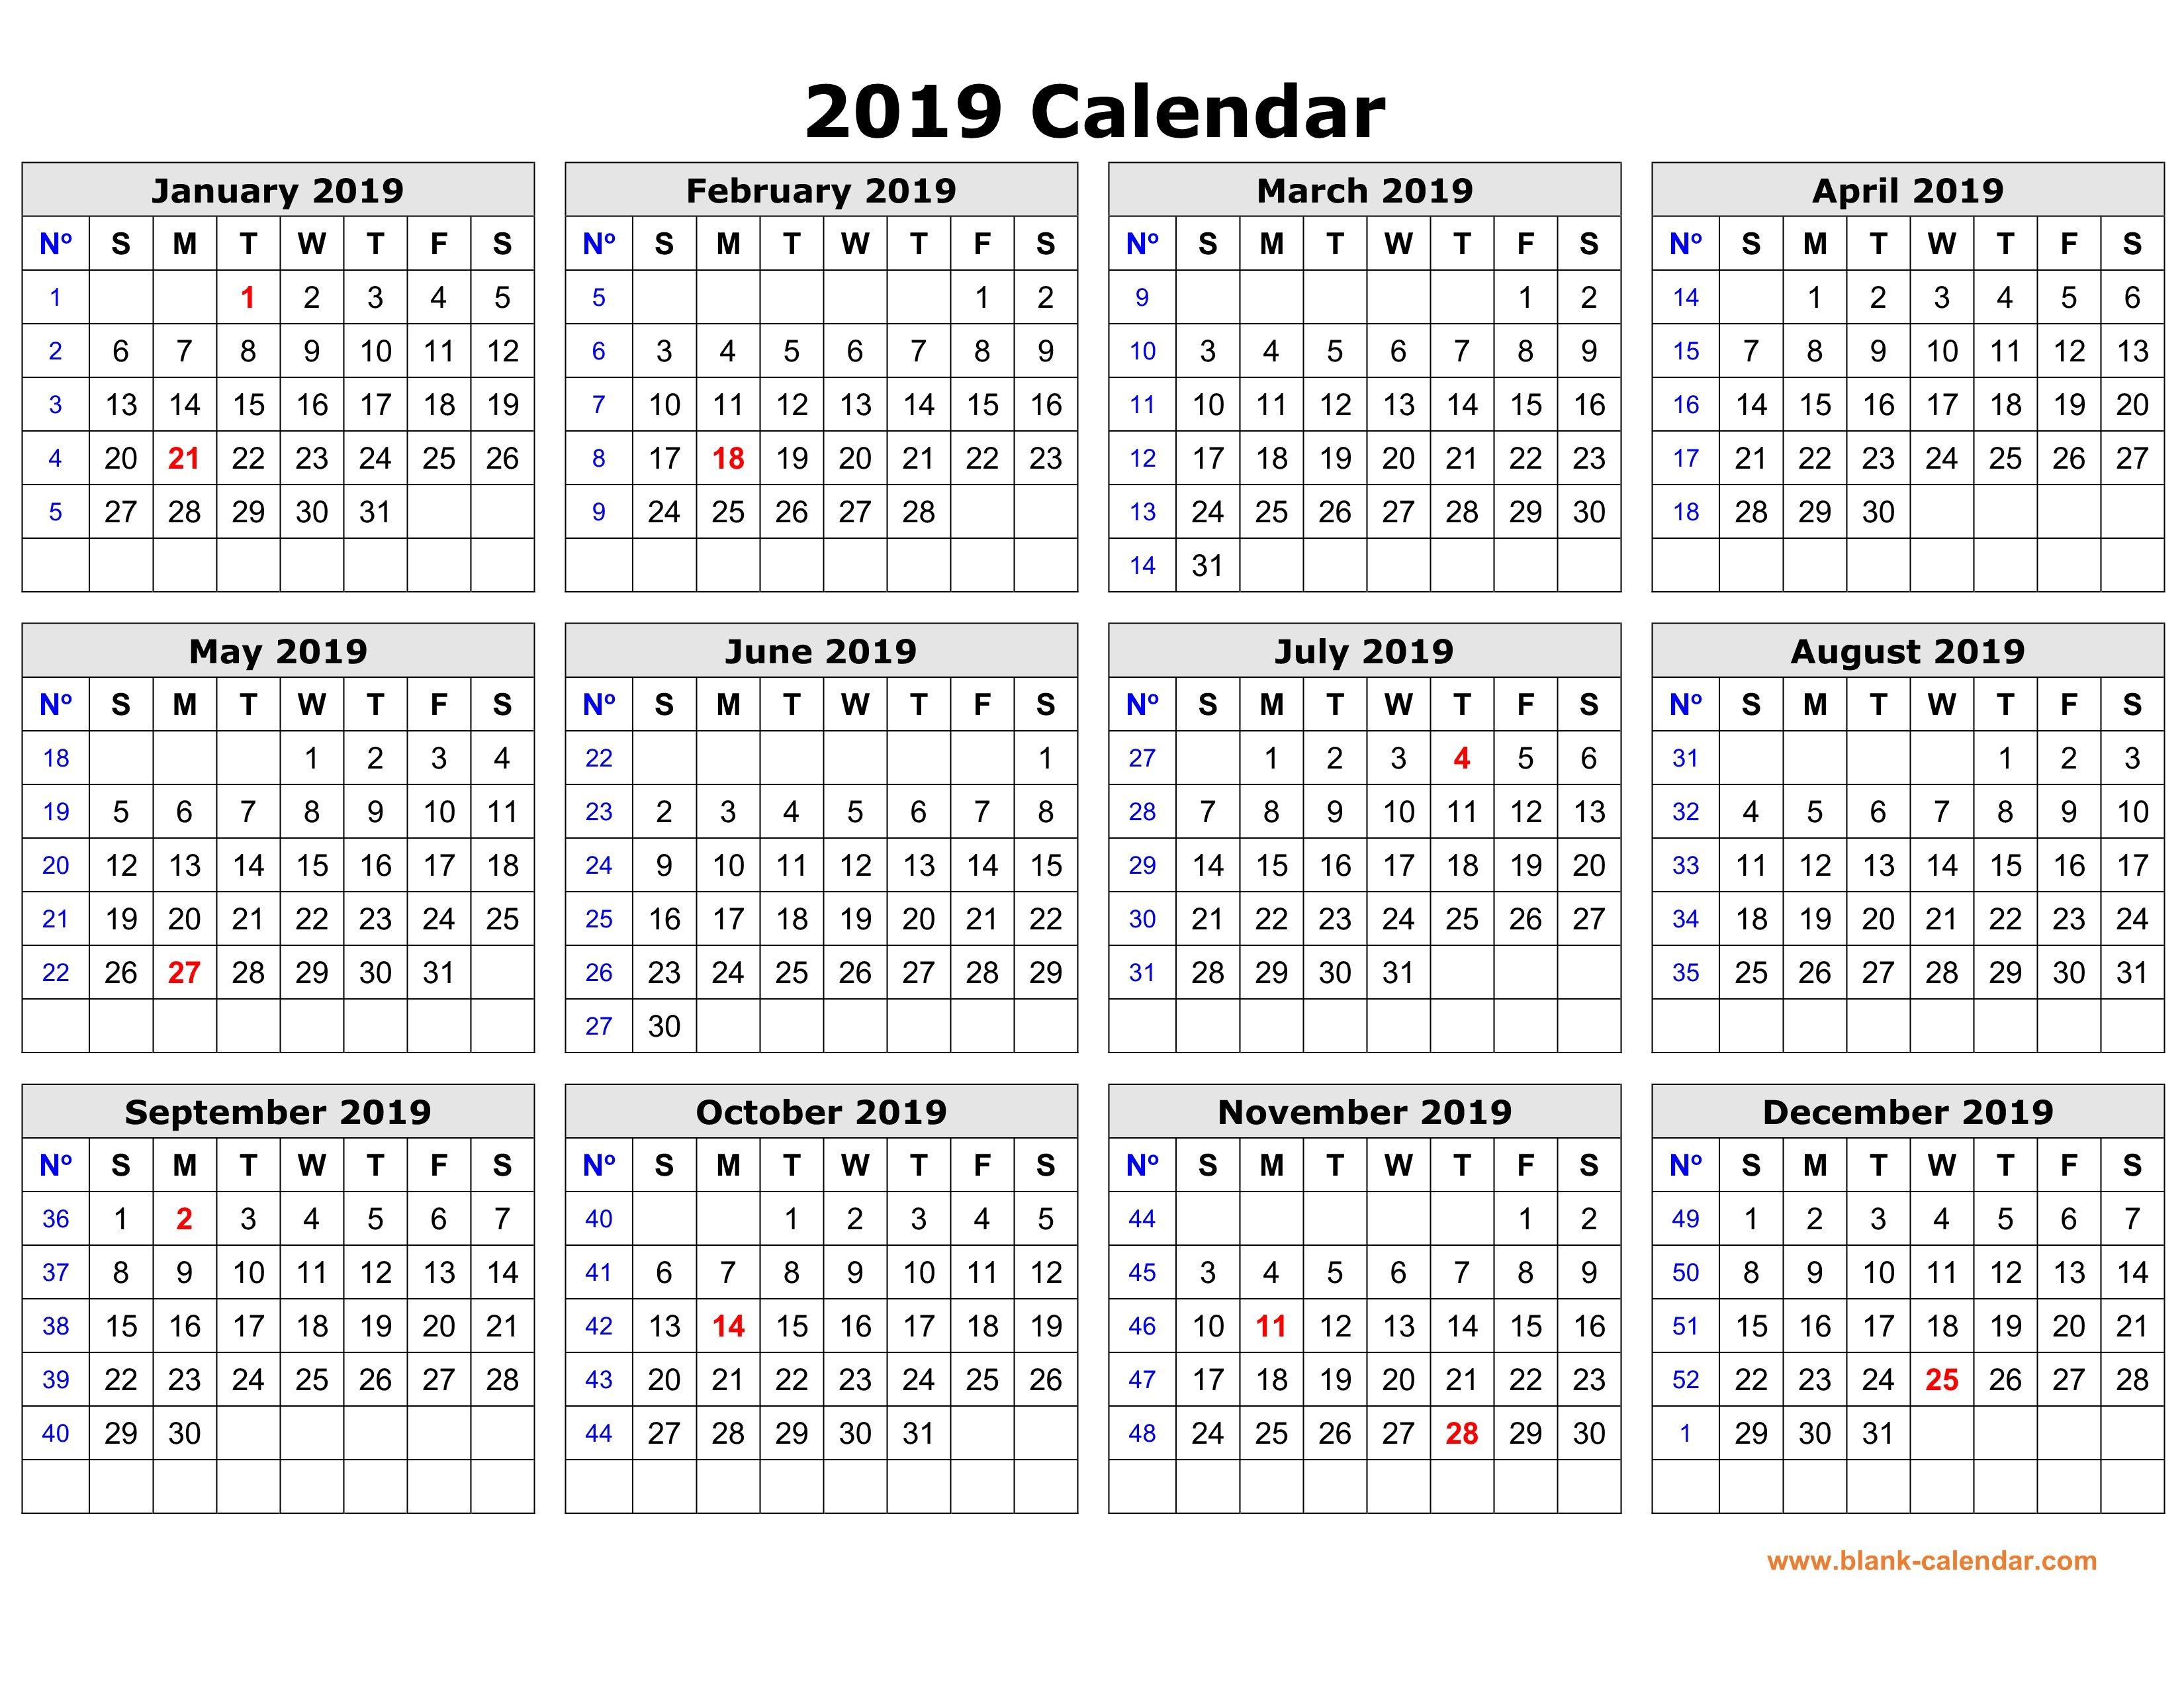 Free Download Printable Calendar 2019 In One Page, Clean Design. Printable 2019 Calendar